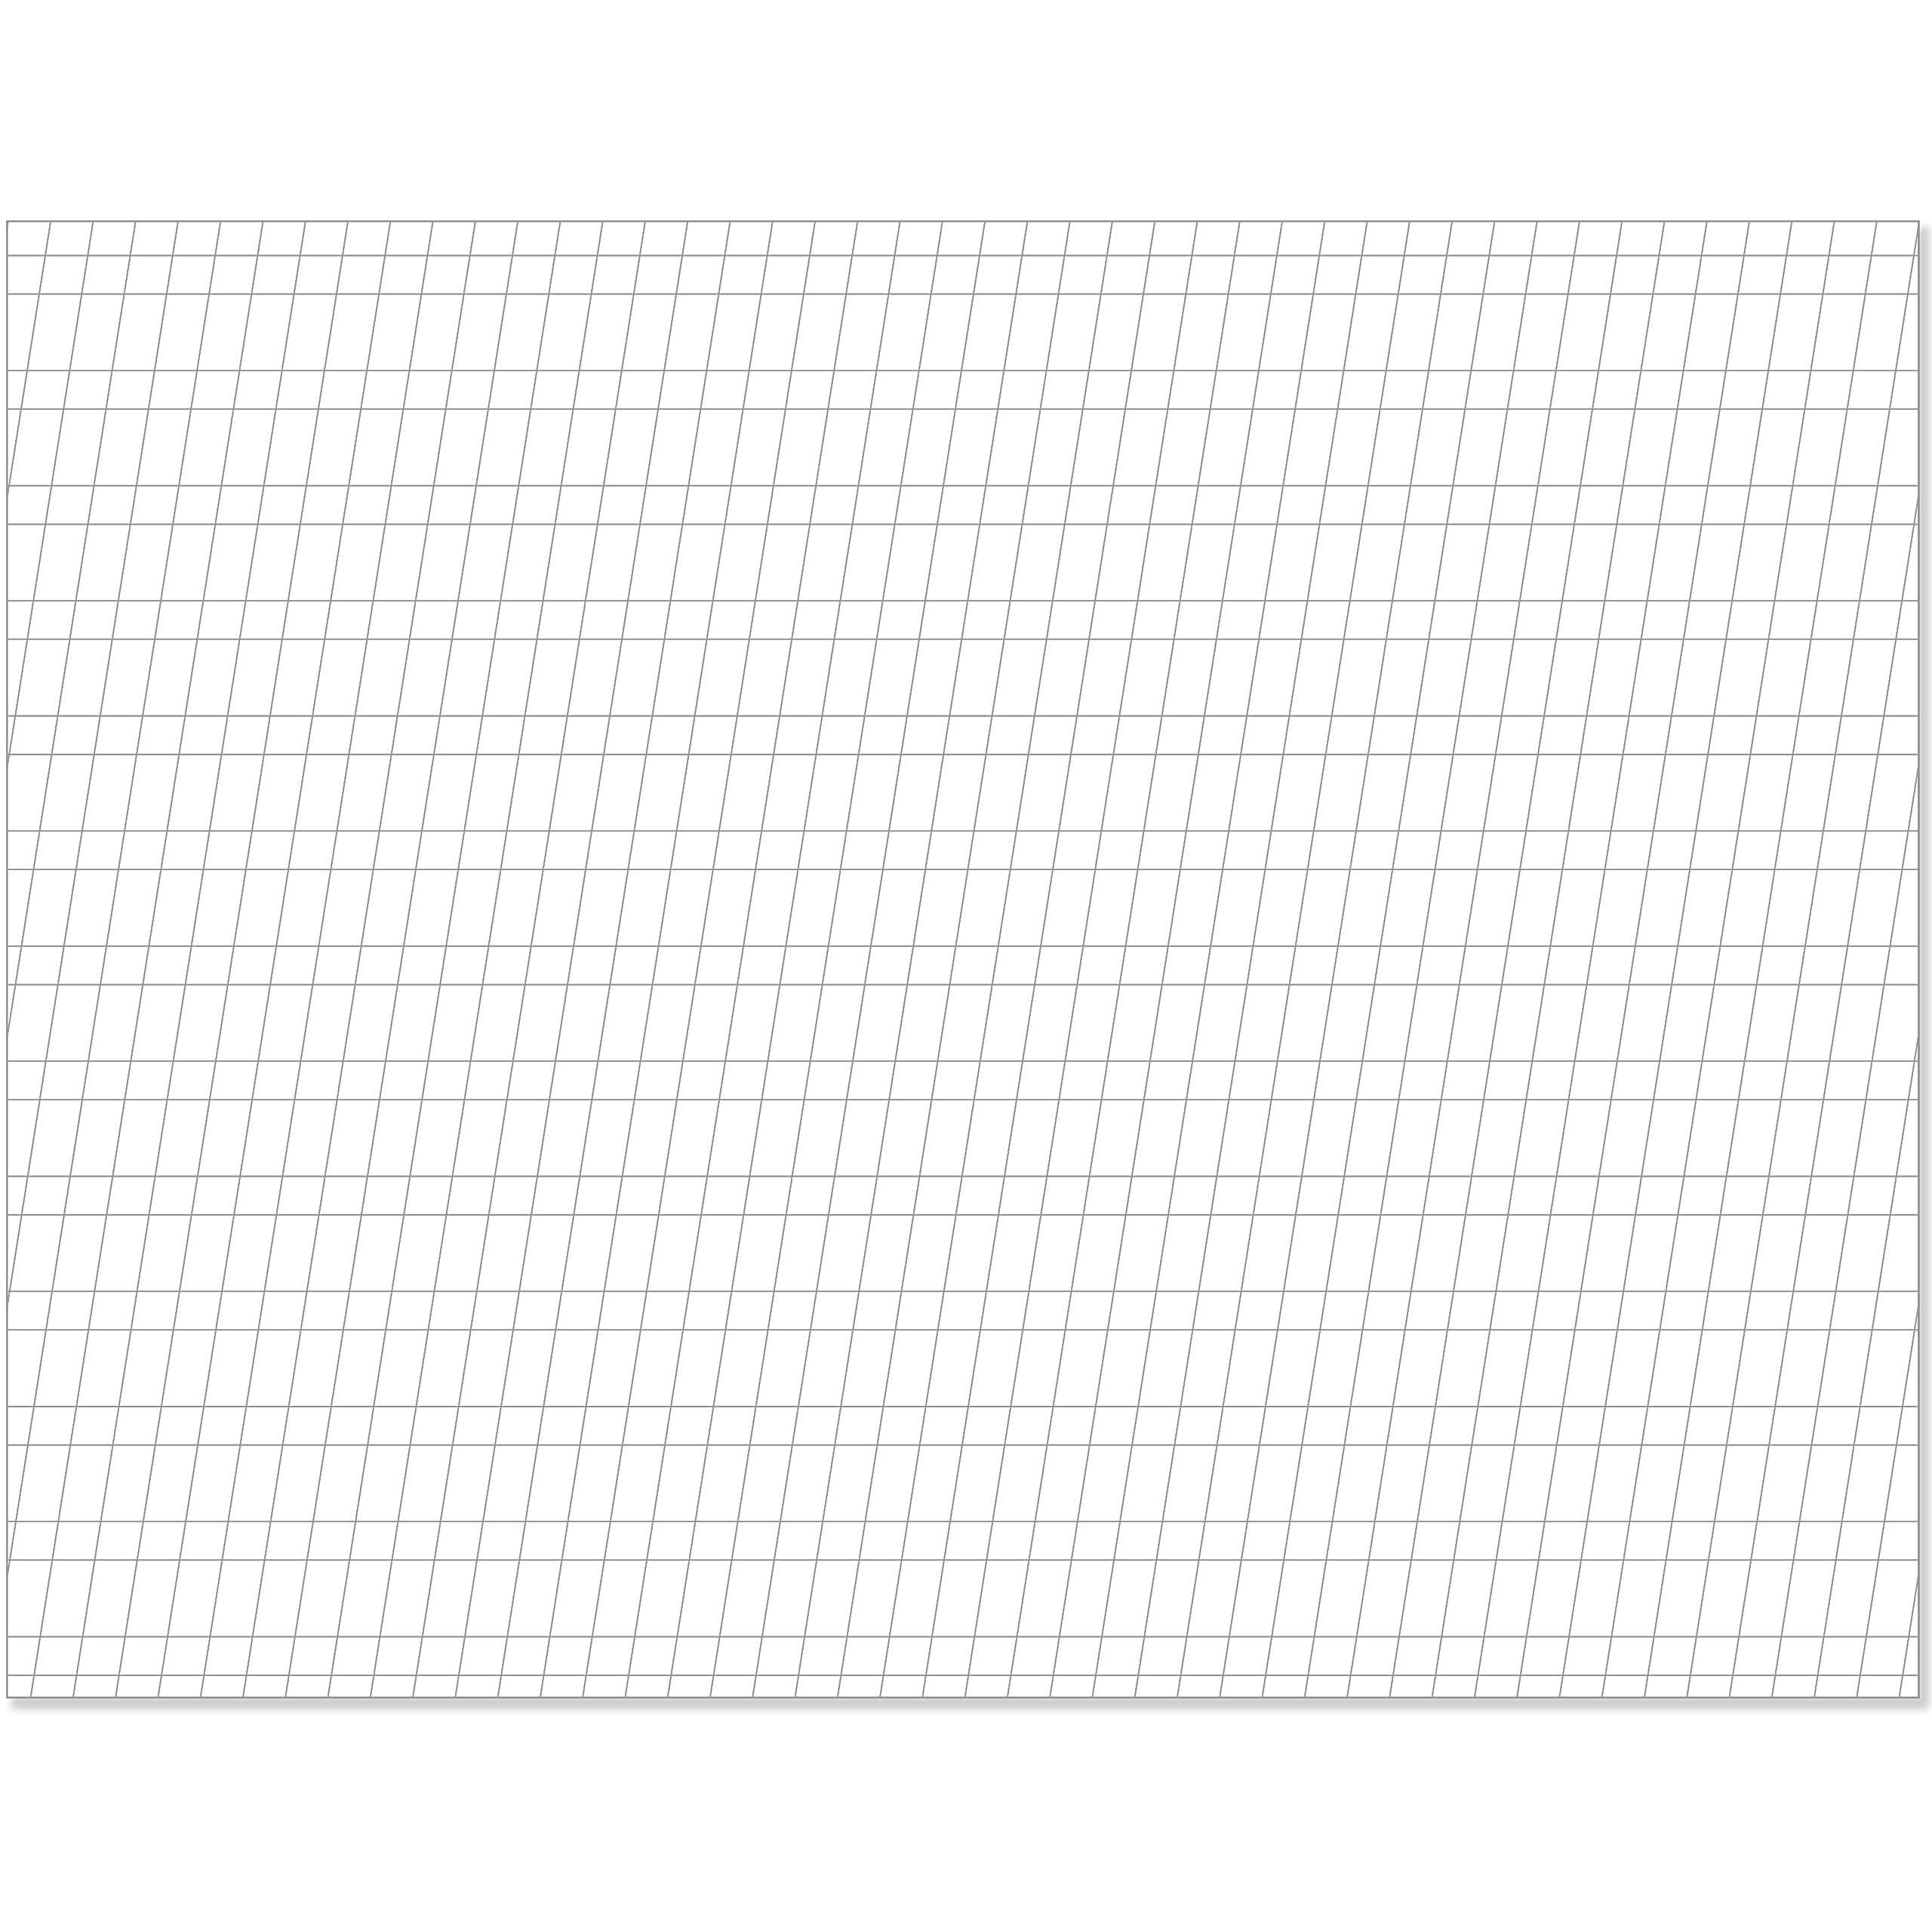 Studio Series Calligraphy Paper Pad (set of 50 heavyweight